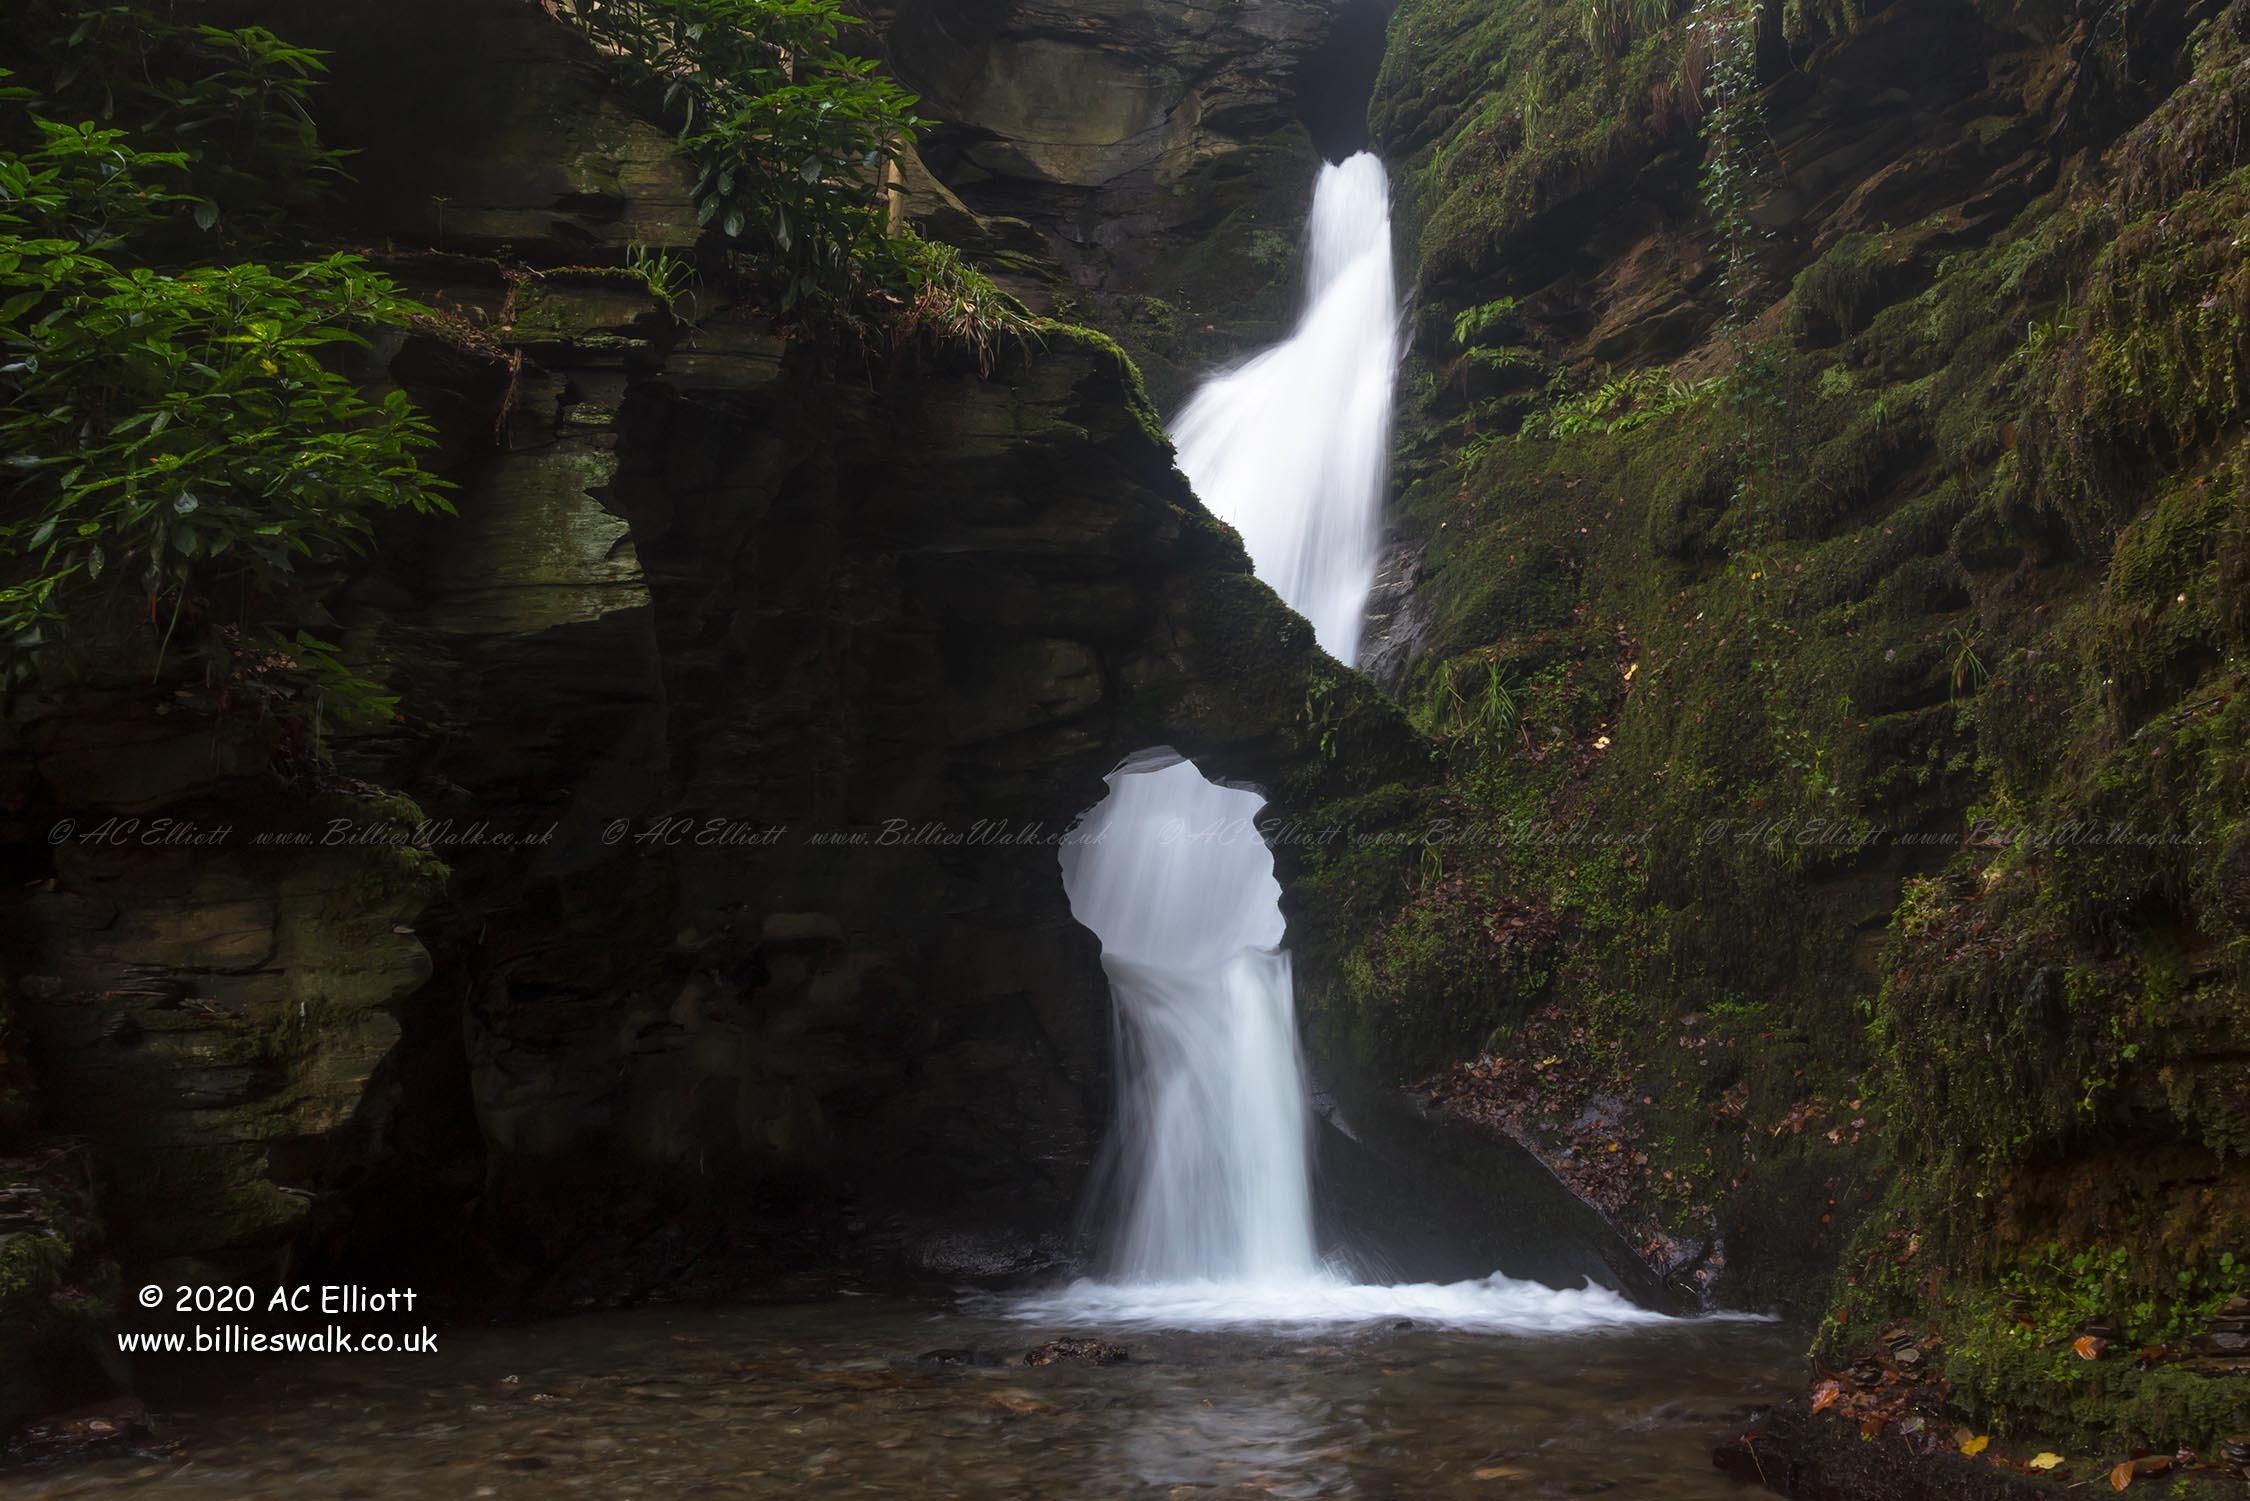 St Nectan's Glen Waterfall